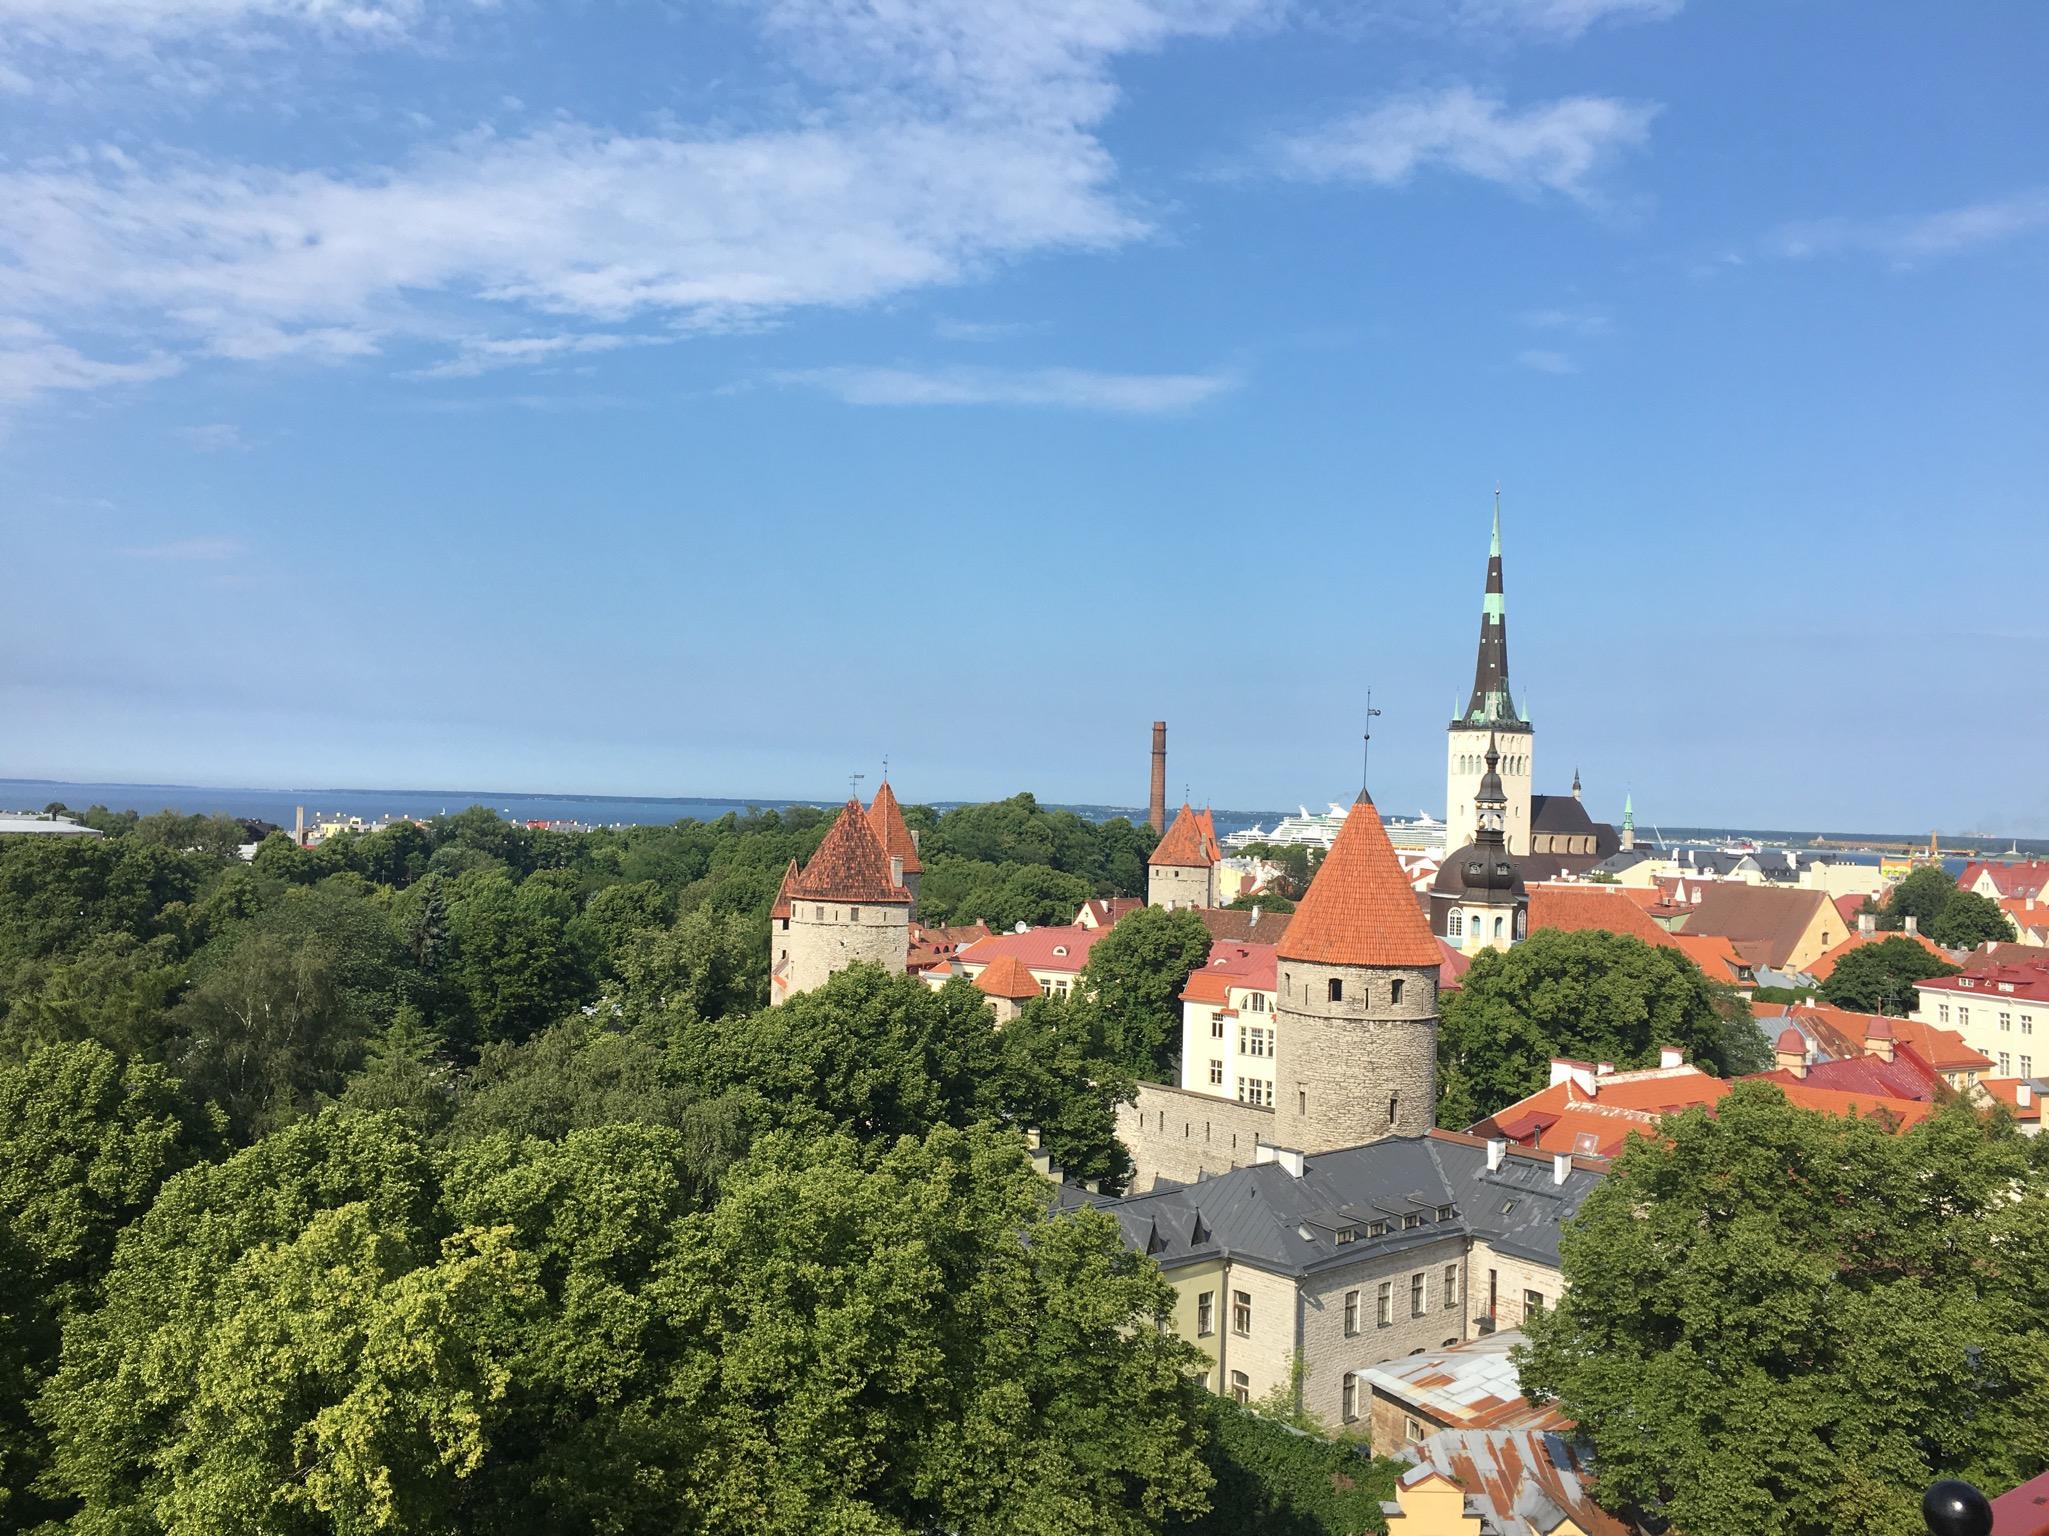 2016 Baltic Sea PerryGolf Cruise - Tallinn, Estonia - PerryGolf.com